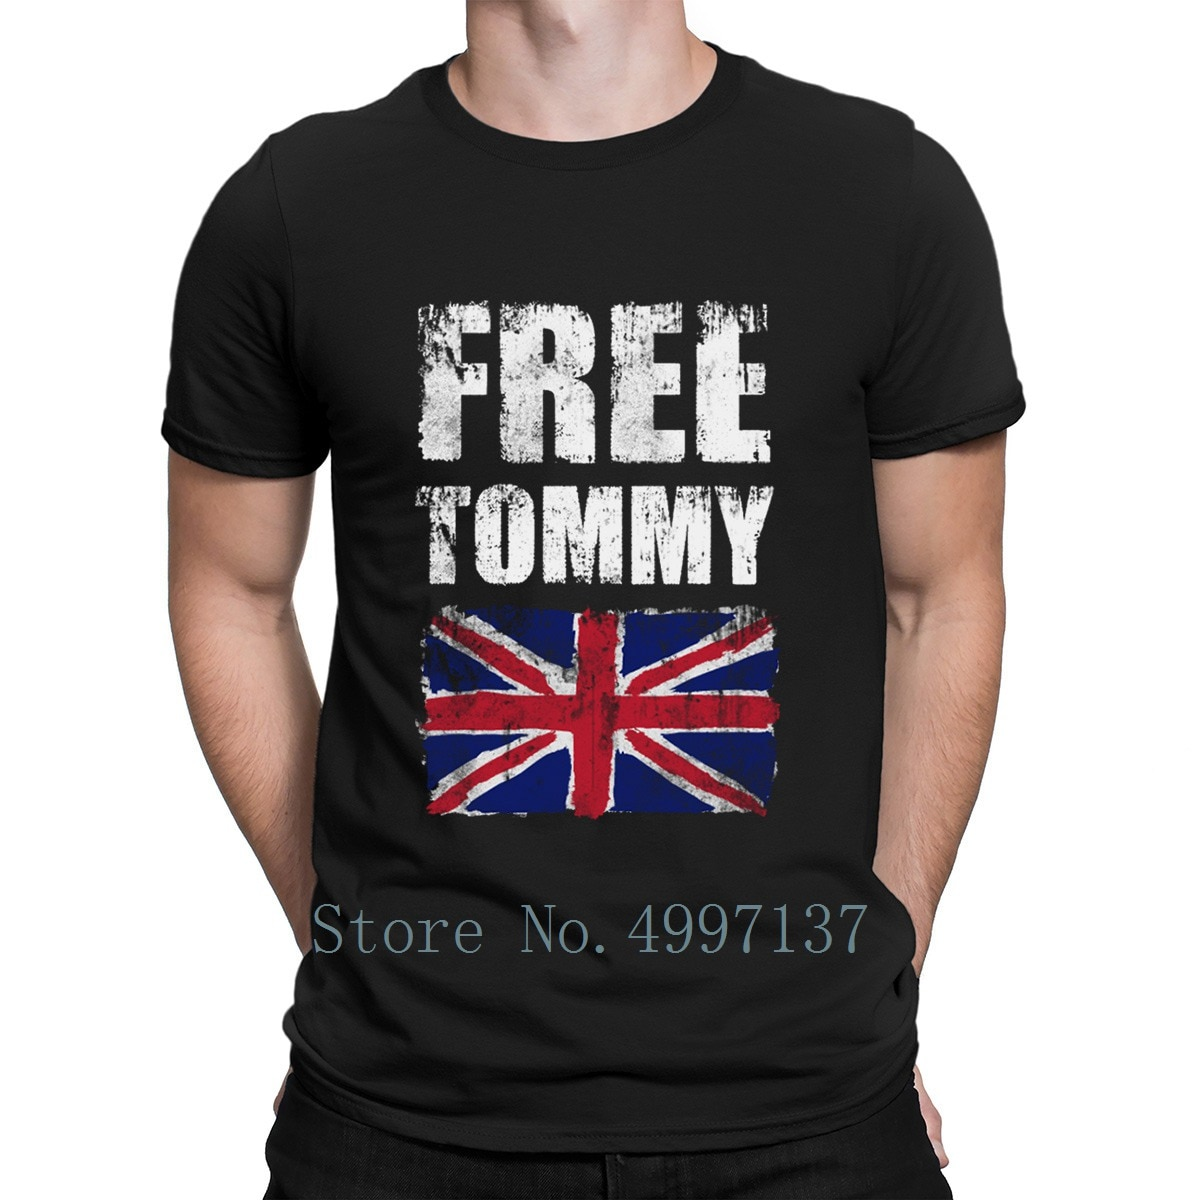 Freetommy Robinson Uk Flag T Shirt Funny Summer Cute Tee Shirt Normal Plus Size 3xl Designer Normal Shirt